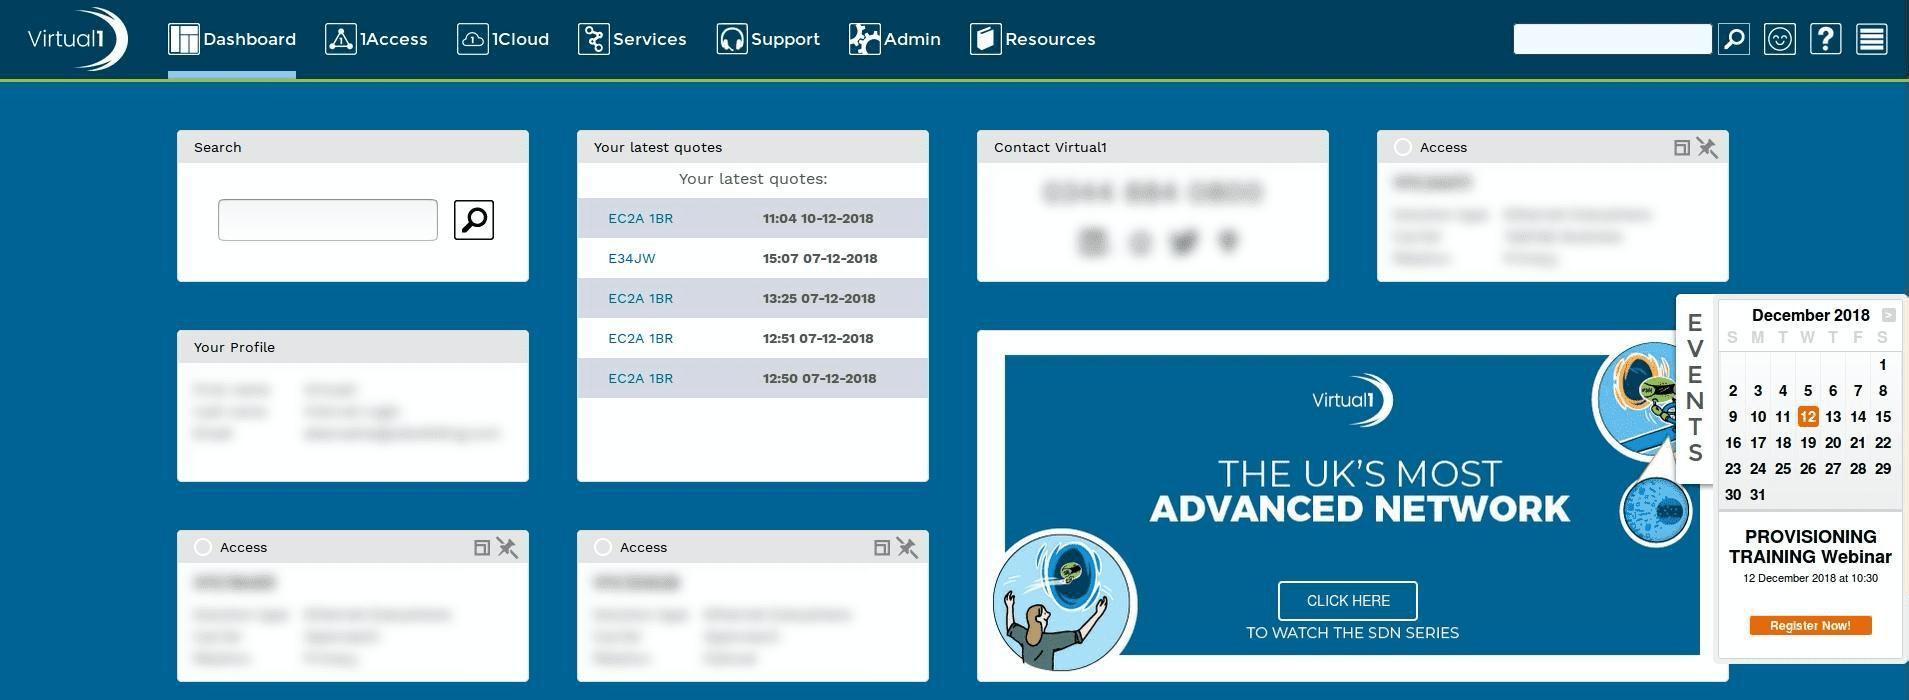 Screenshot of Virtual1 interface